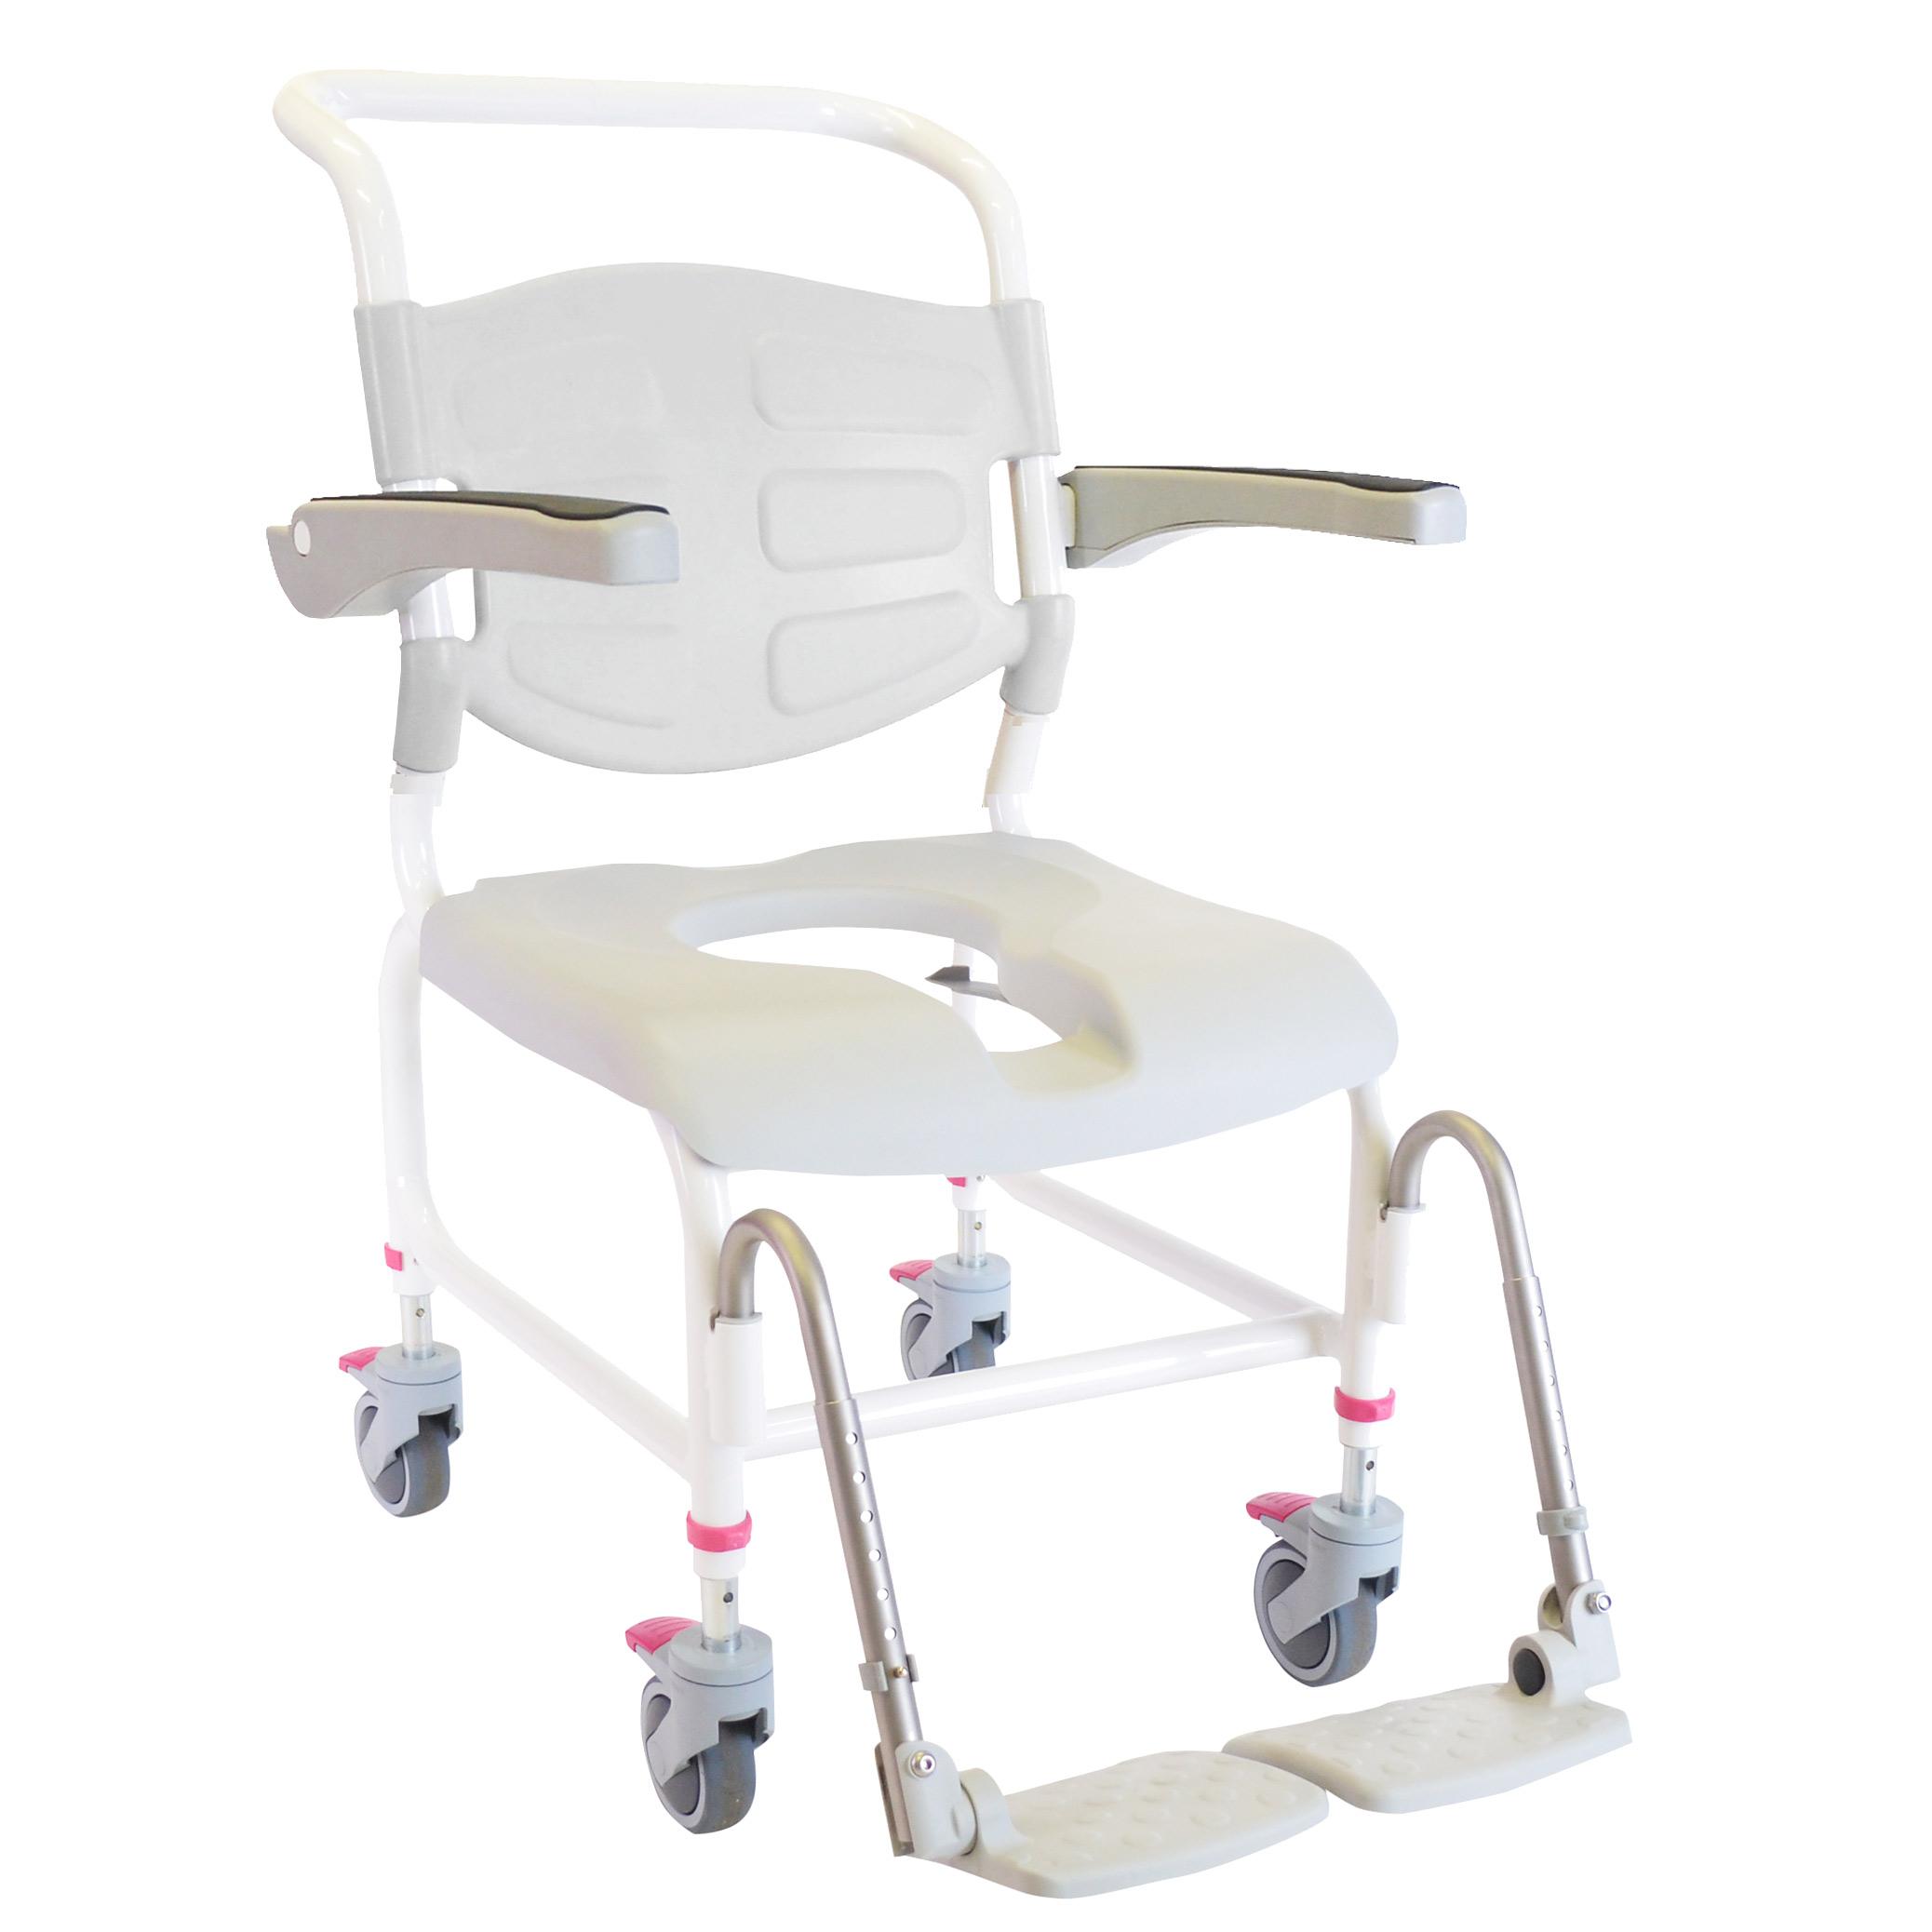 HMN Height Adjustable Shower mode Chair